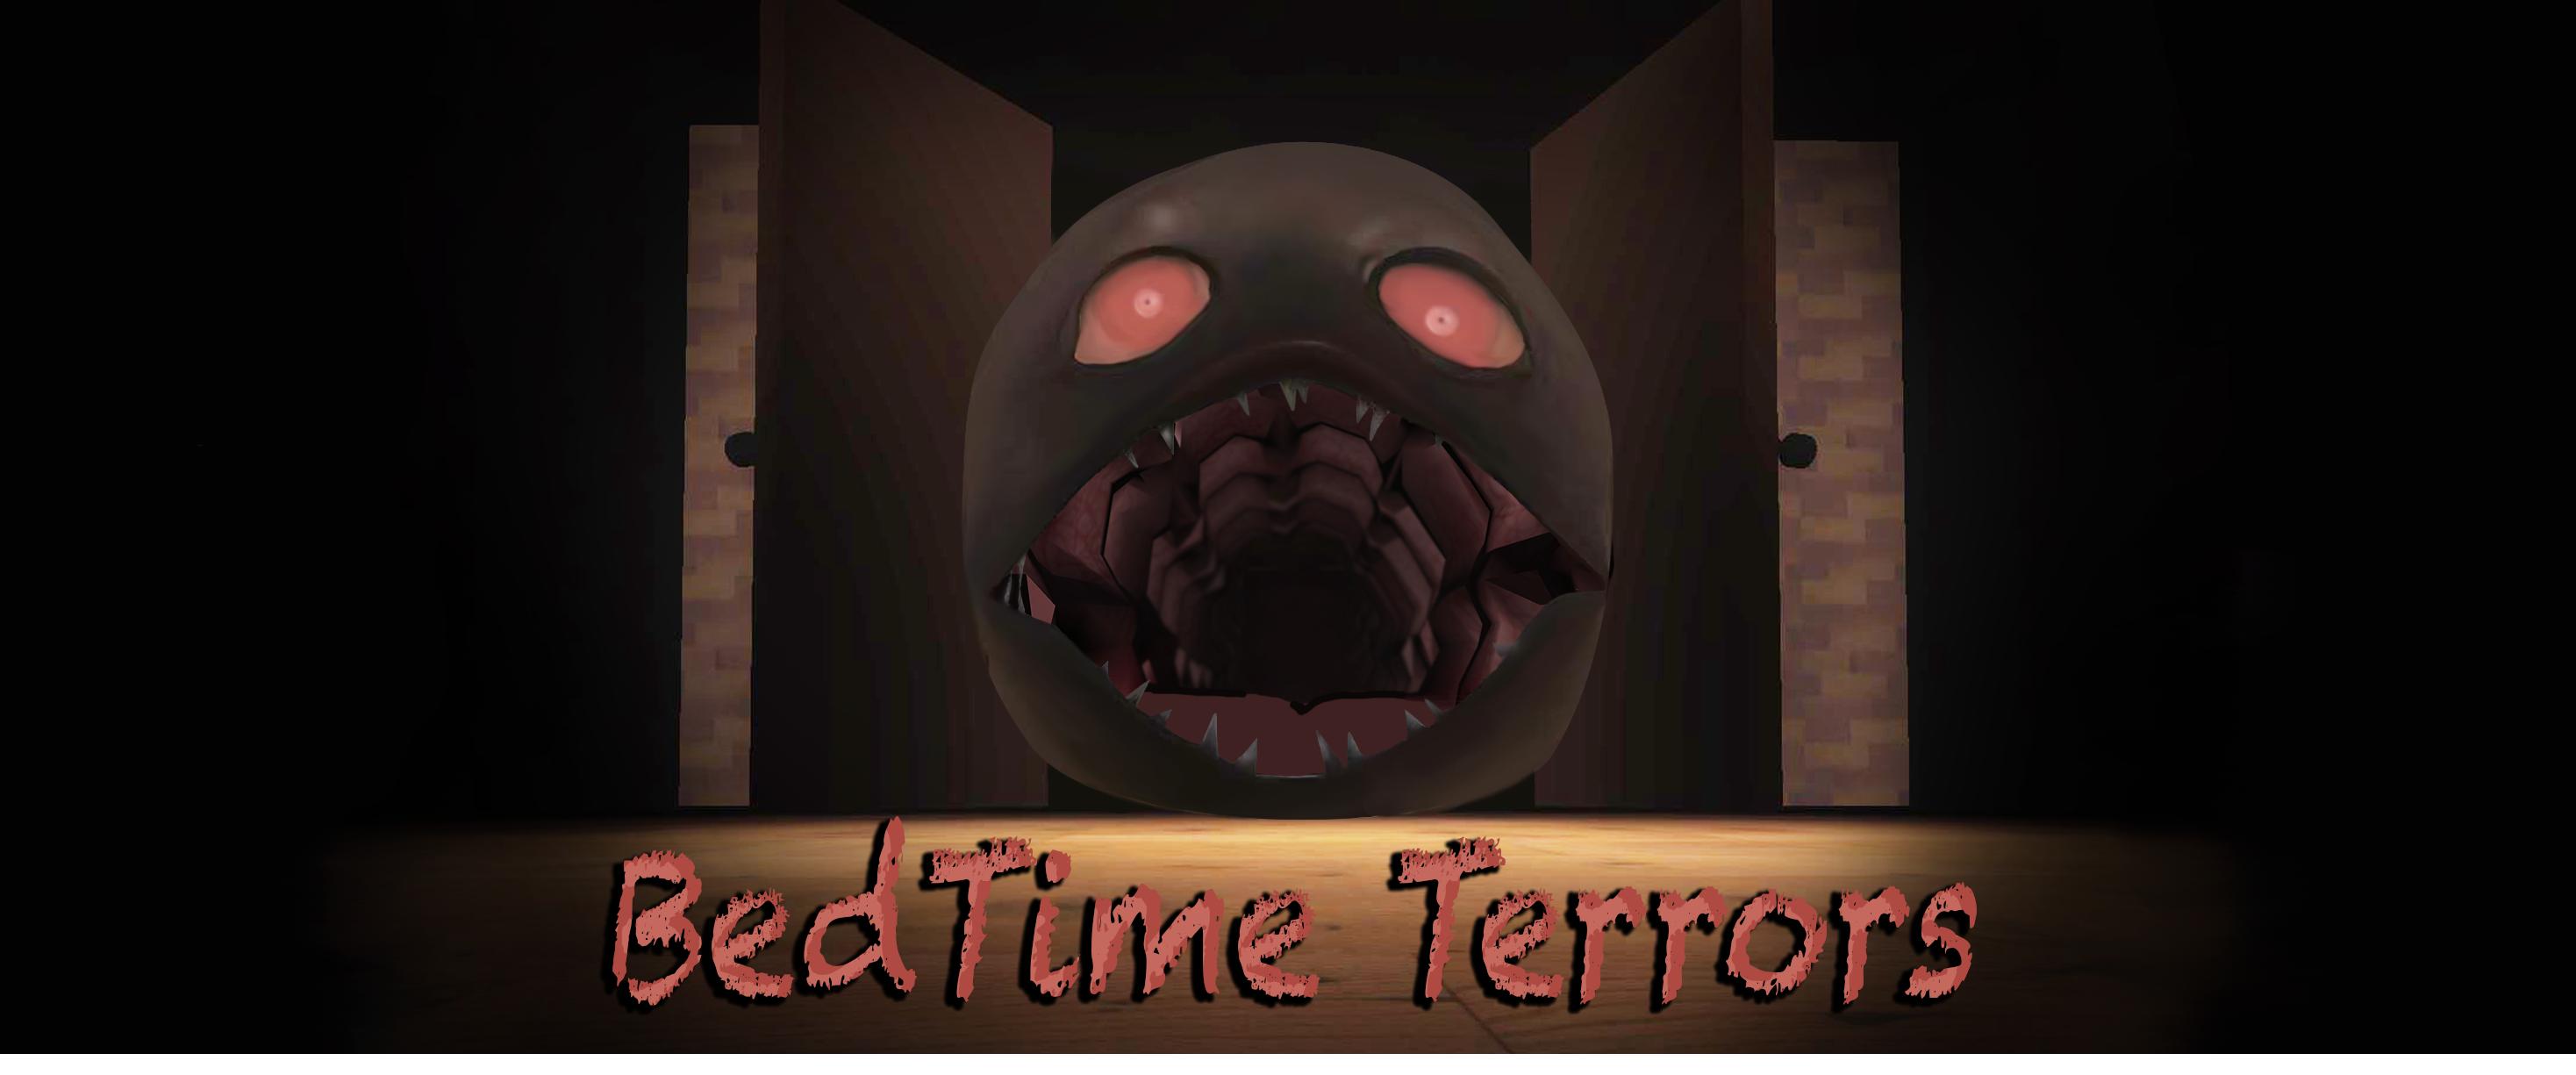 Bedtime Terrors